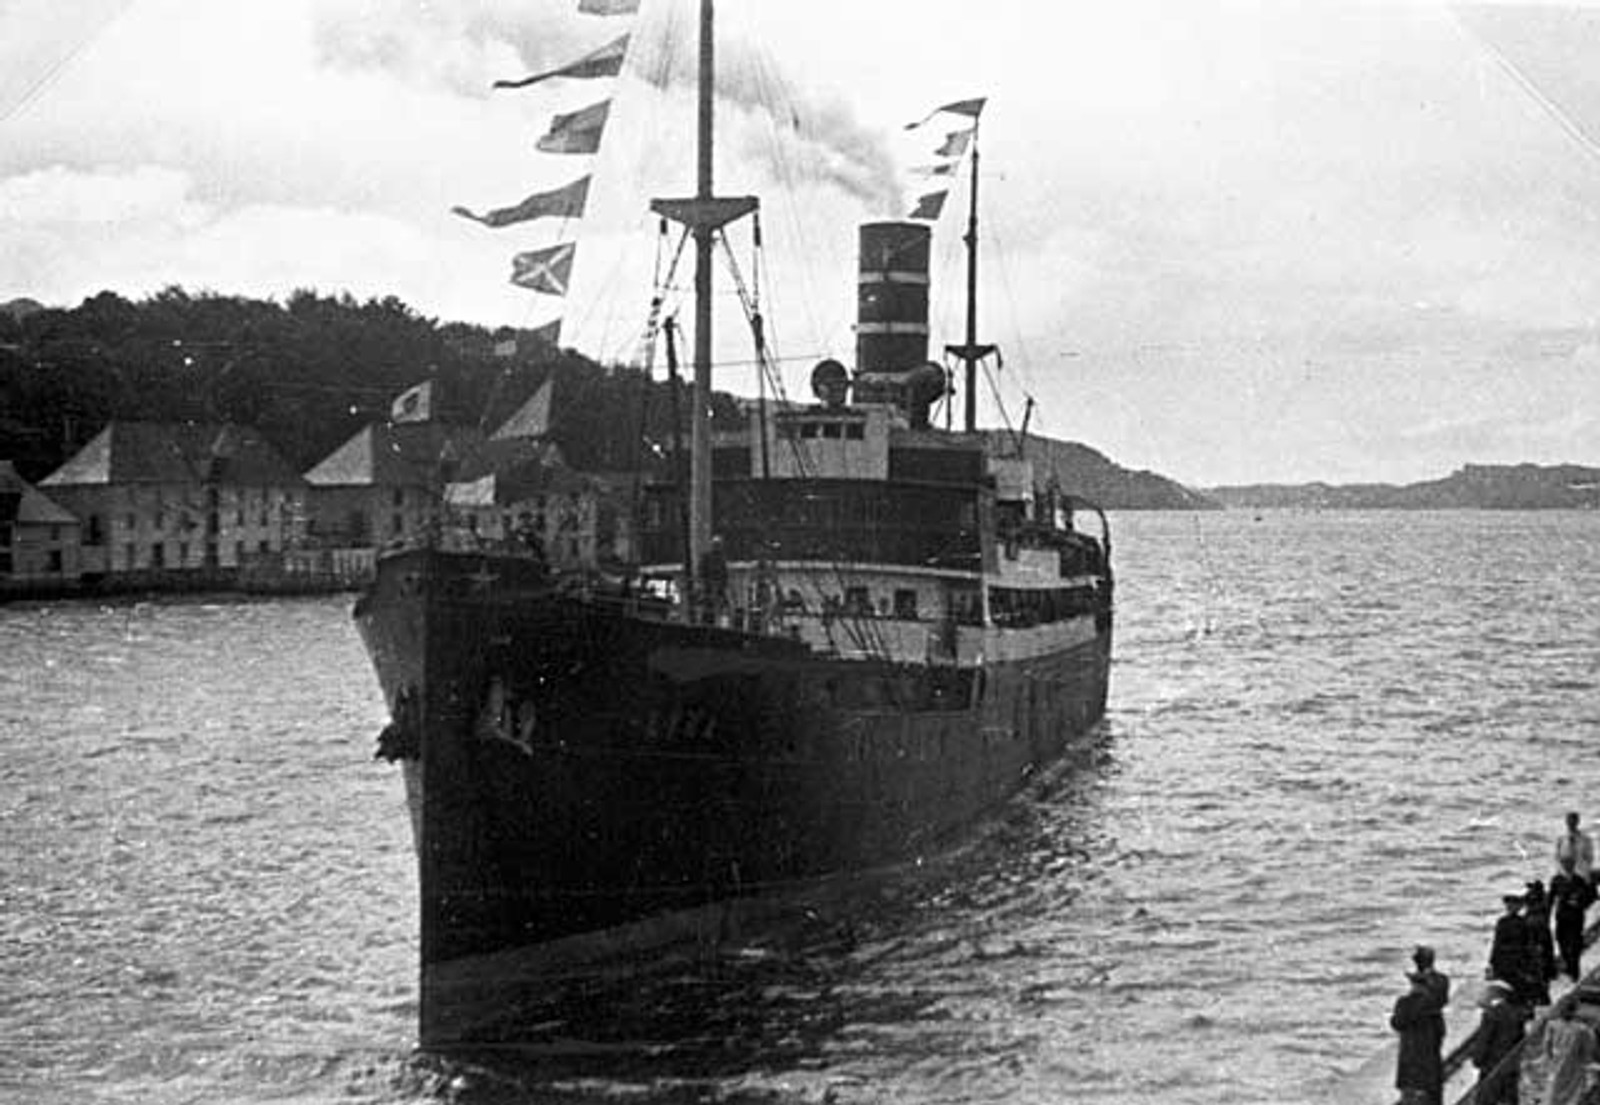 ENGLANDSRETUR: Den første englandsbåten ankommer Bergen havn i mai 1945.